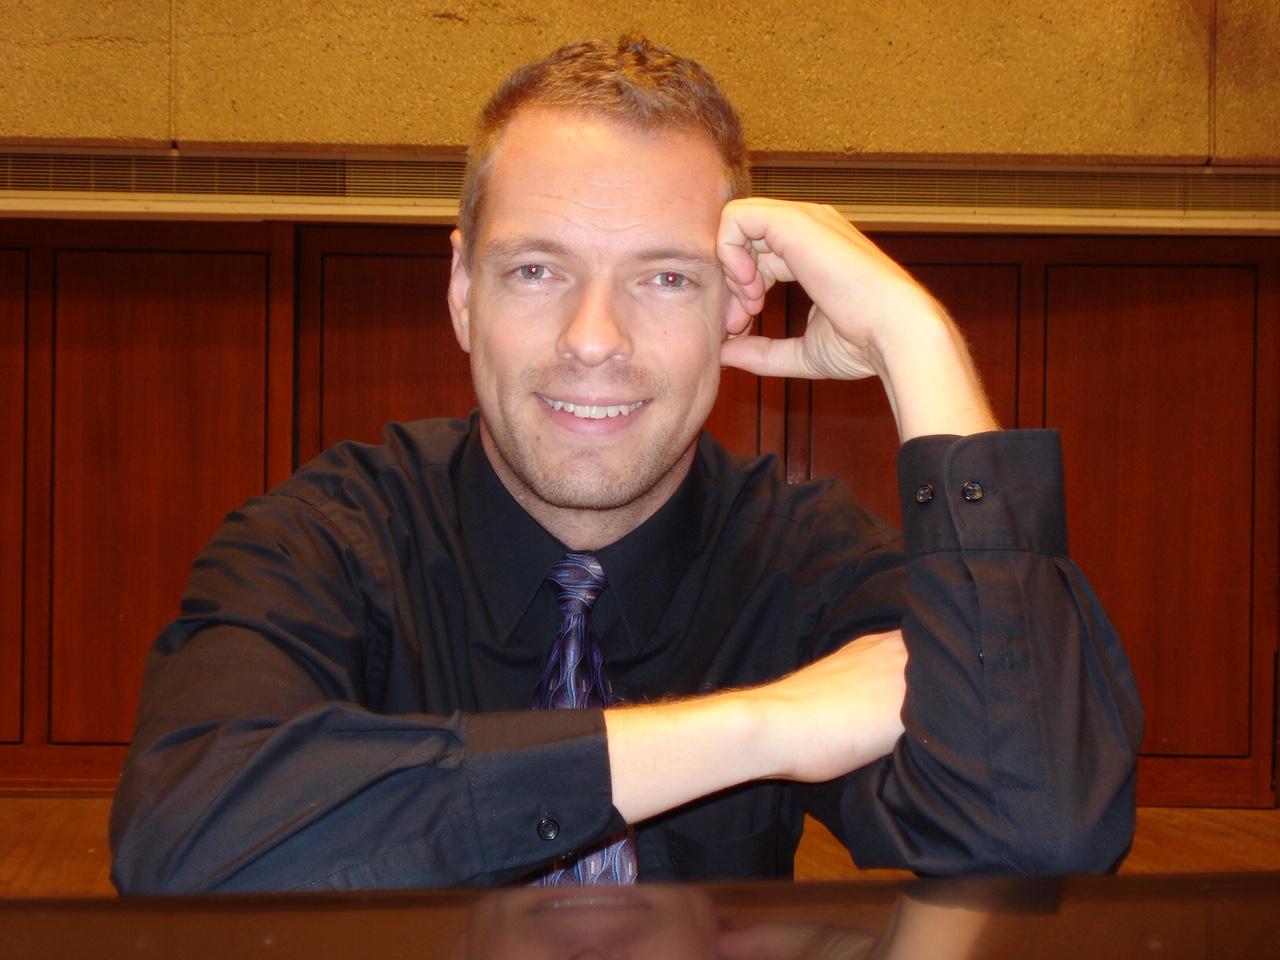 Johan Botes, Organist